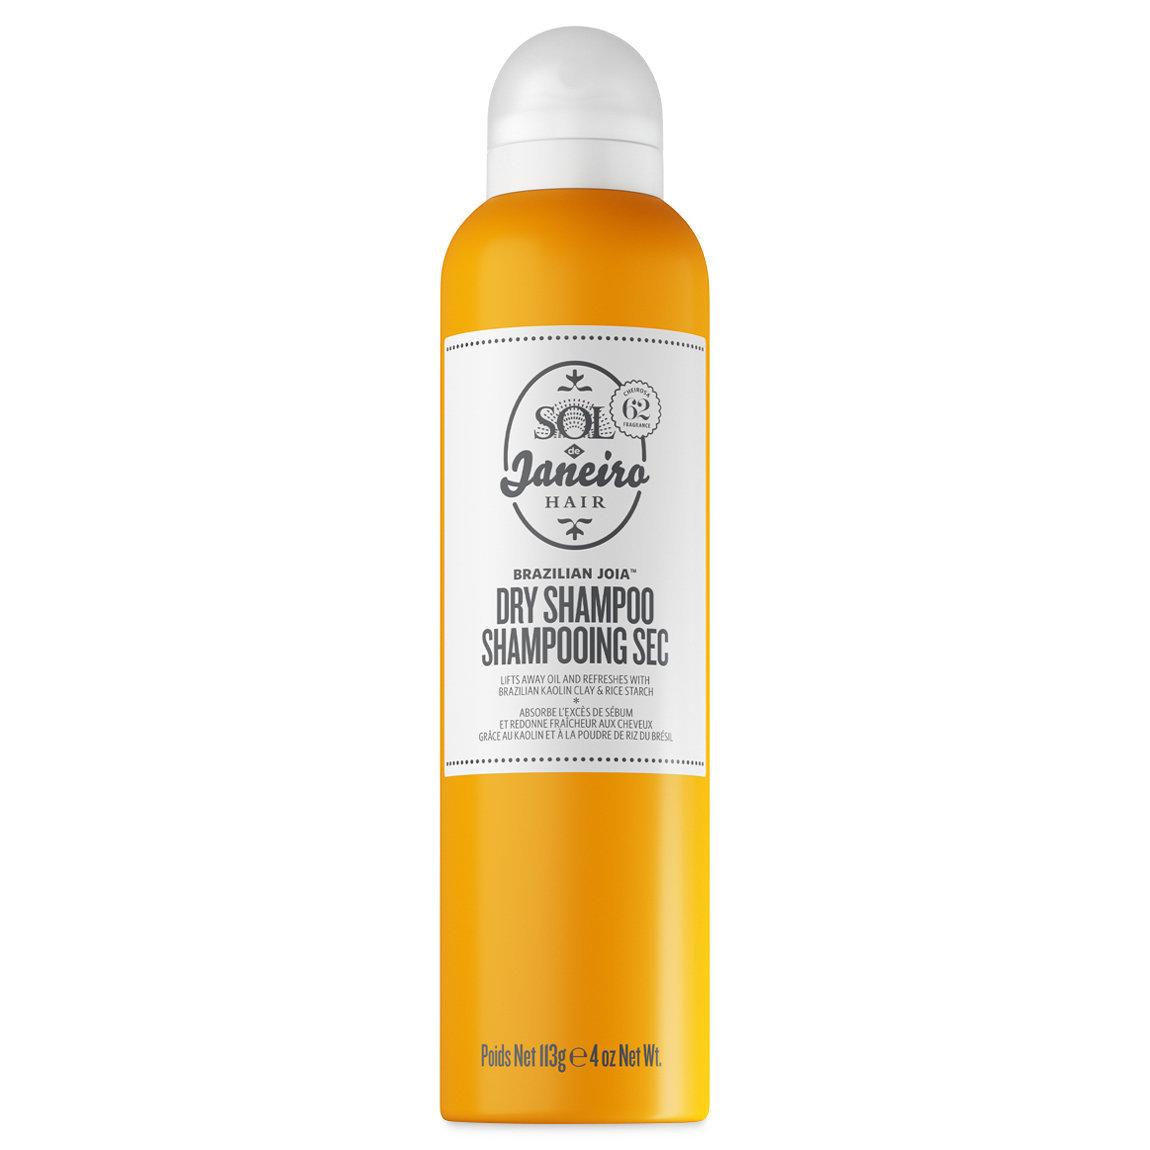 Sol de Janeiro Brazilian Joia Refreshing Dry Shampoo alternative view 1 - product swatch.